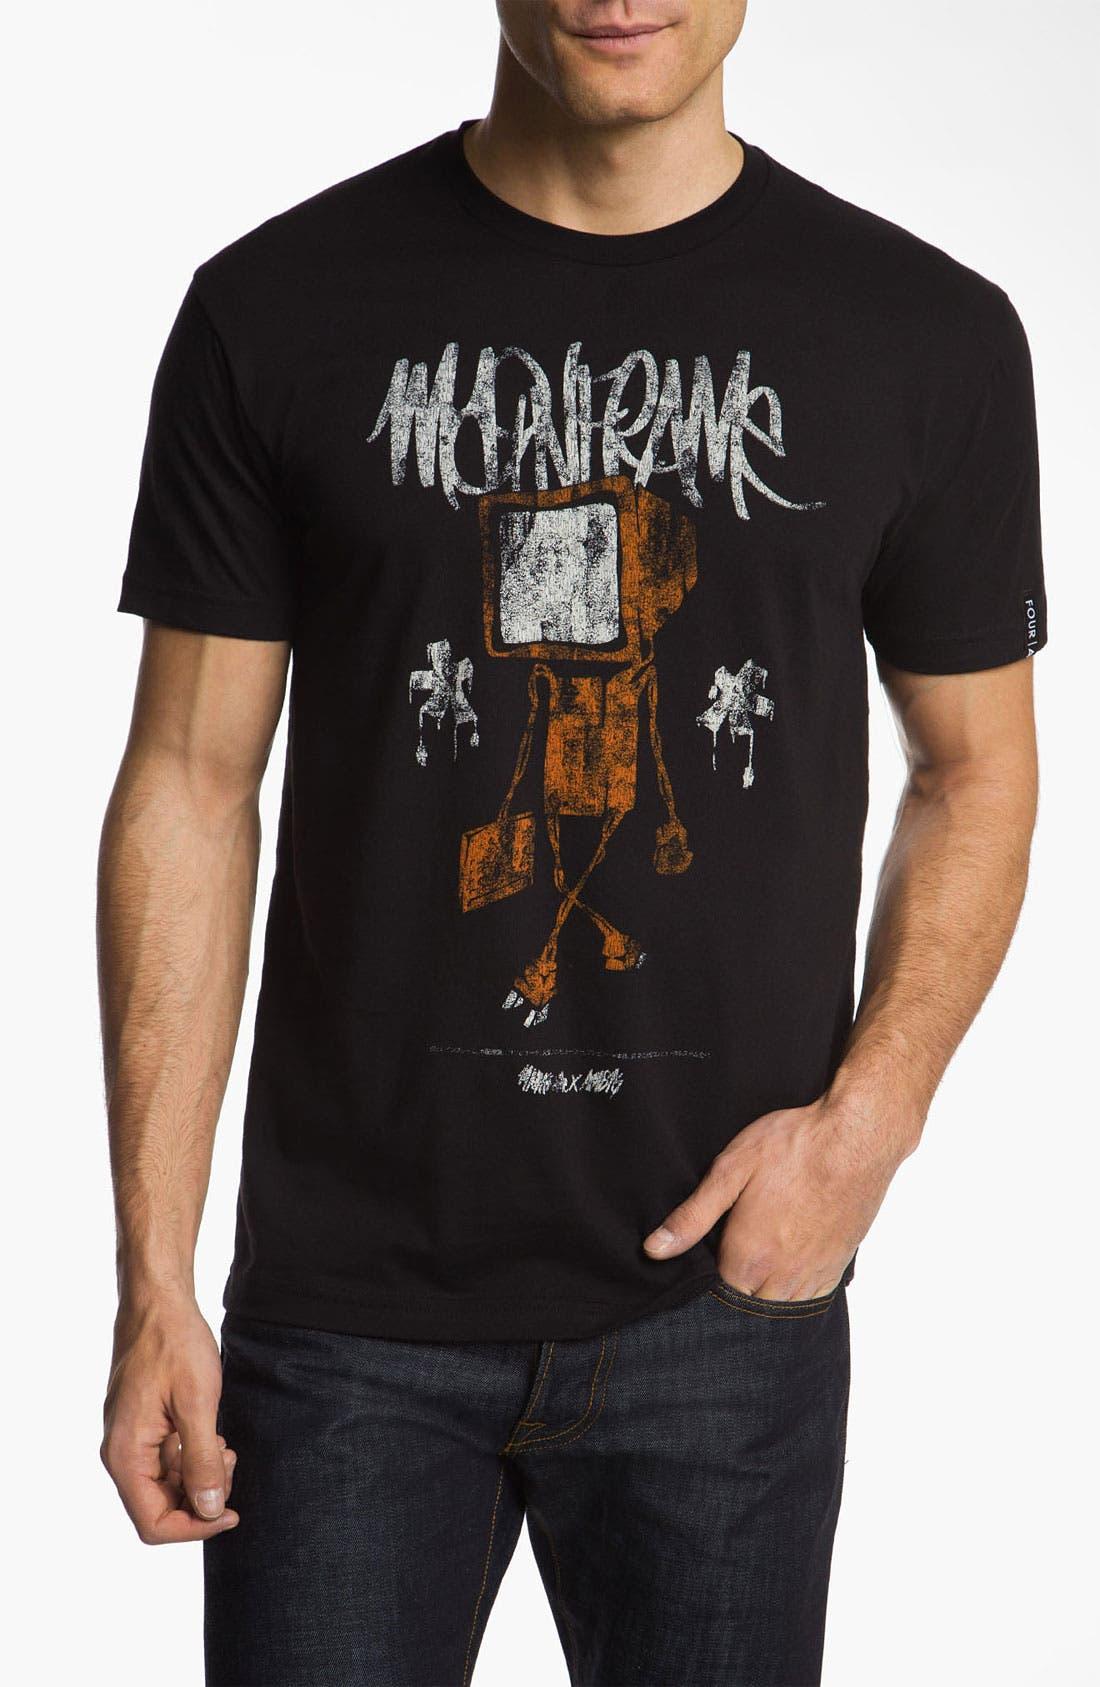 Main Image - Ambiguous 'Mainframe' T-Shirt